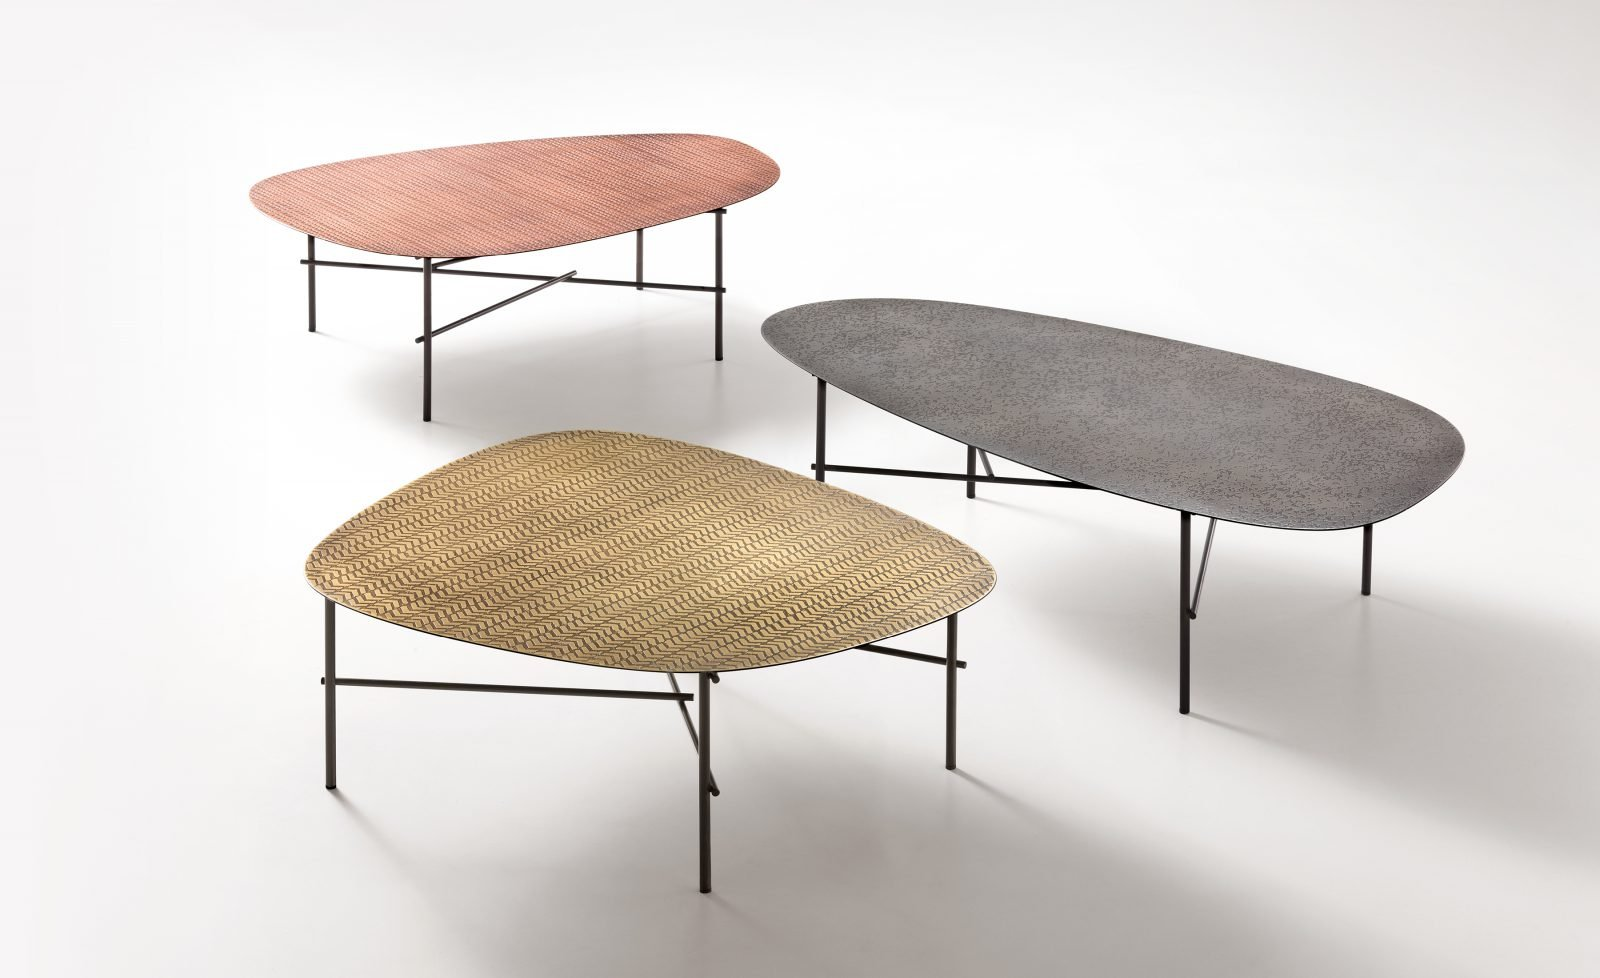 Syro XL Table end from De Castelli, designed by Emilio Nanni